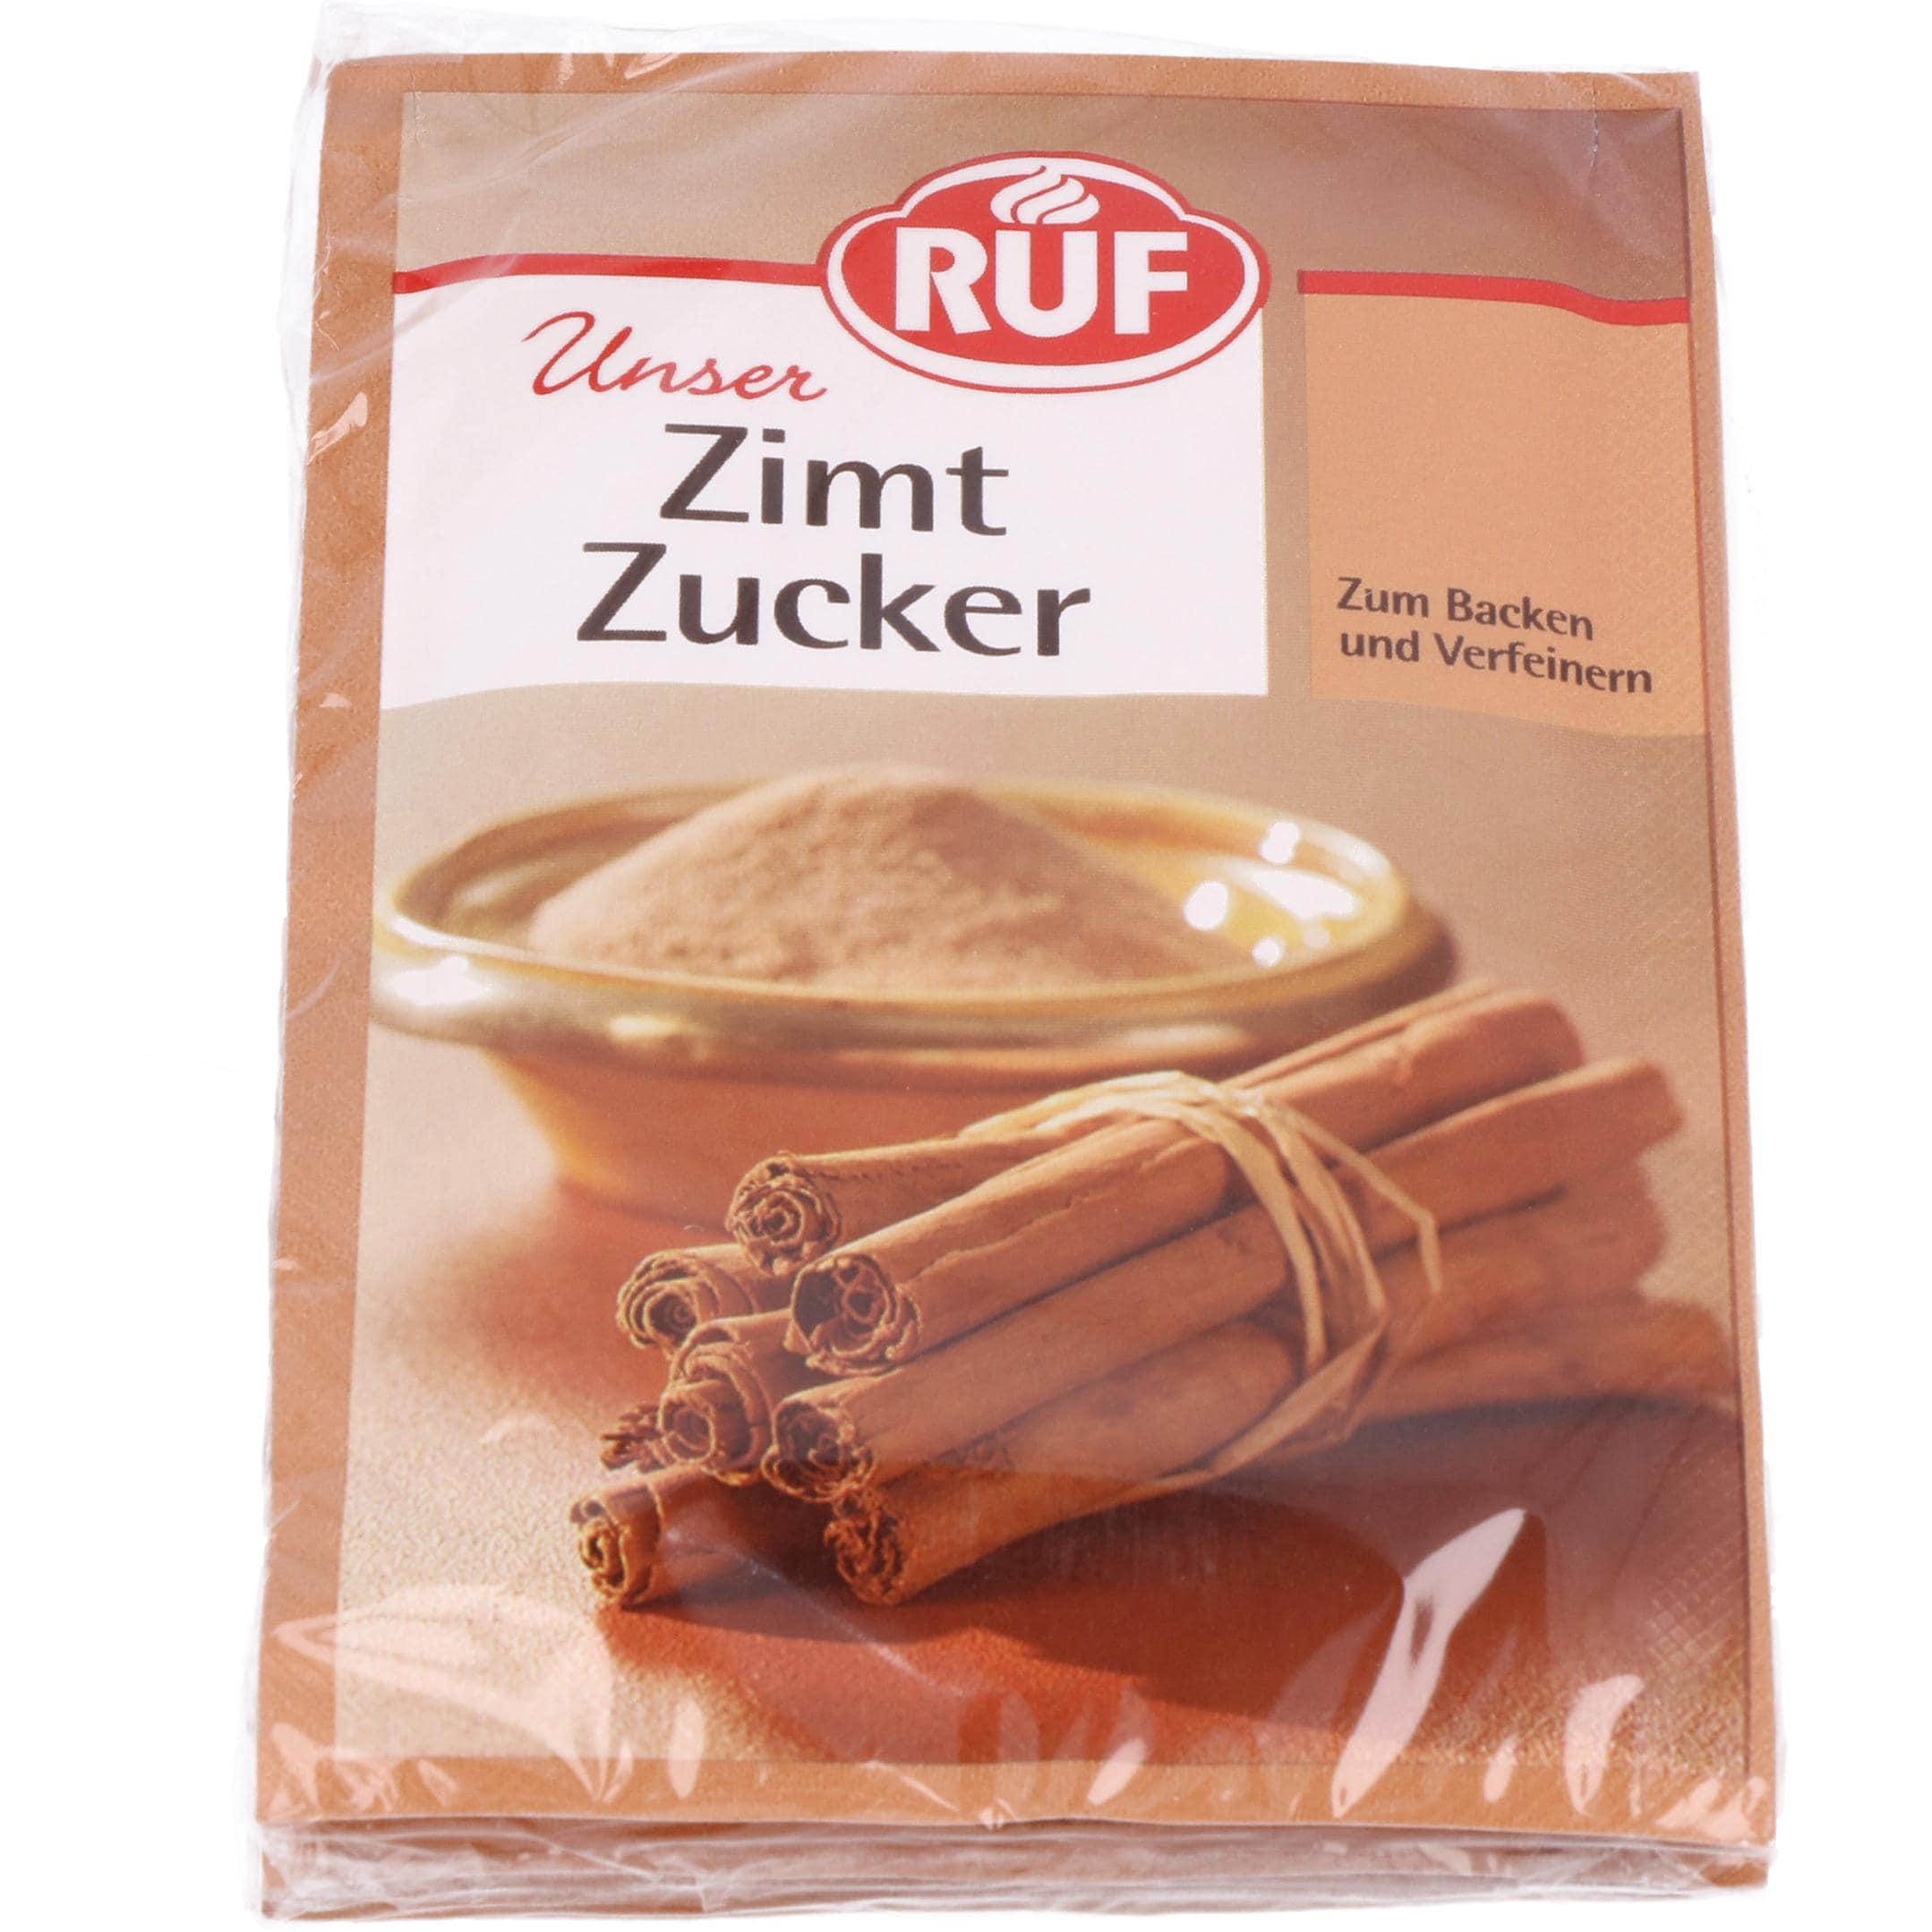 Ruf Zimt-Zucker 60g